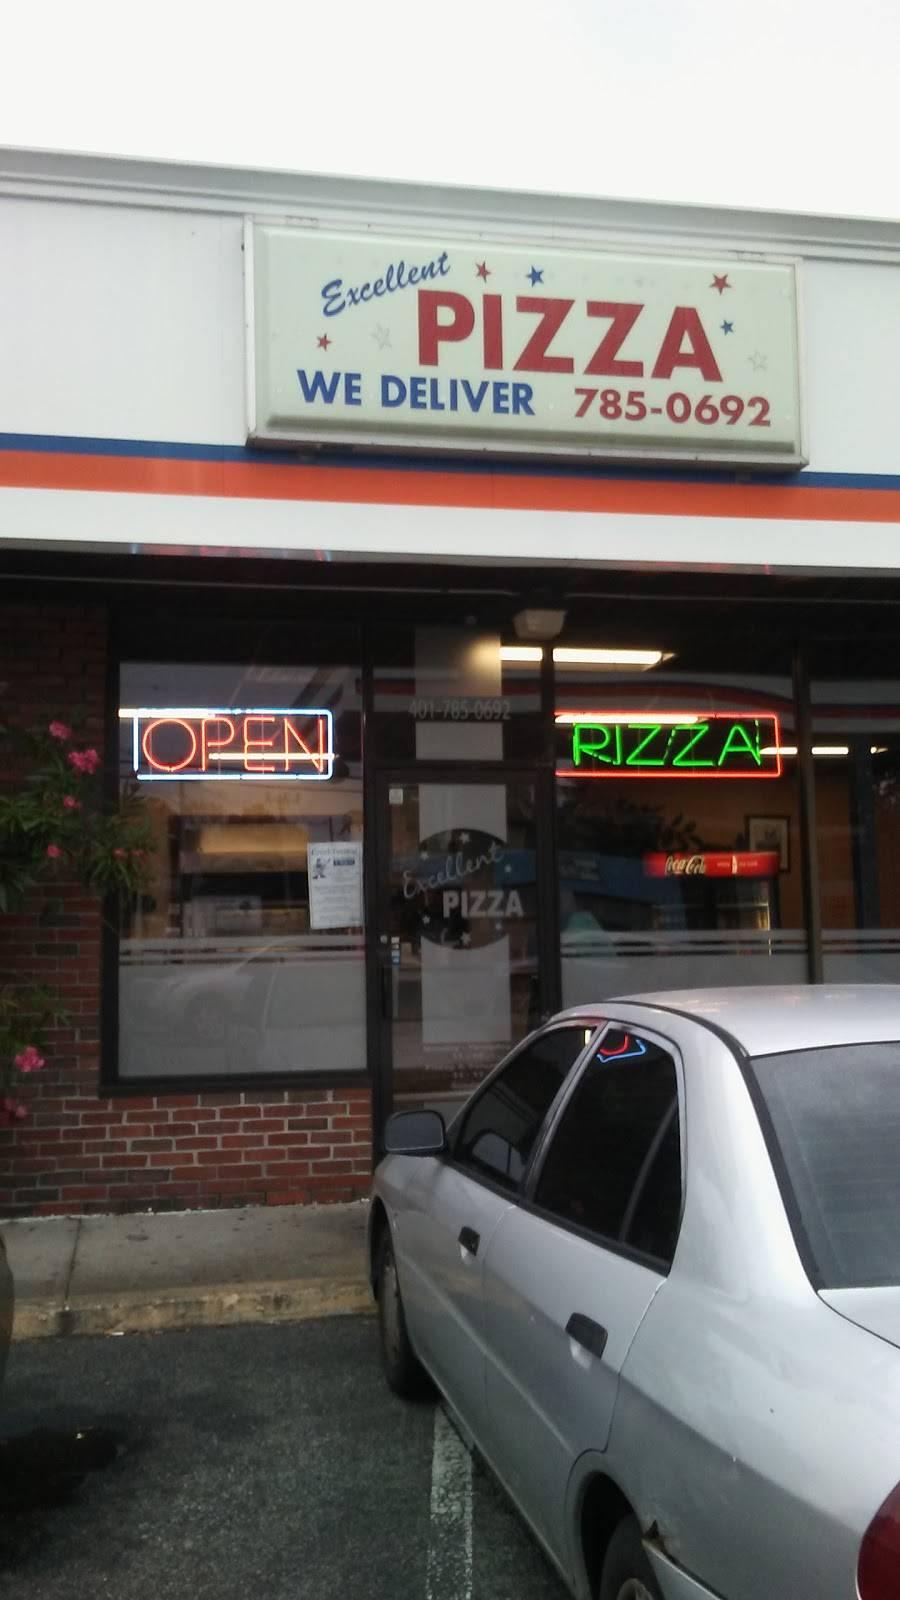 Excellent Pizza | restaurant | 255 Reservoir Ave, Providence, RI 02907, USA | 4017850692 OR +1 401-785-0692